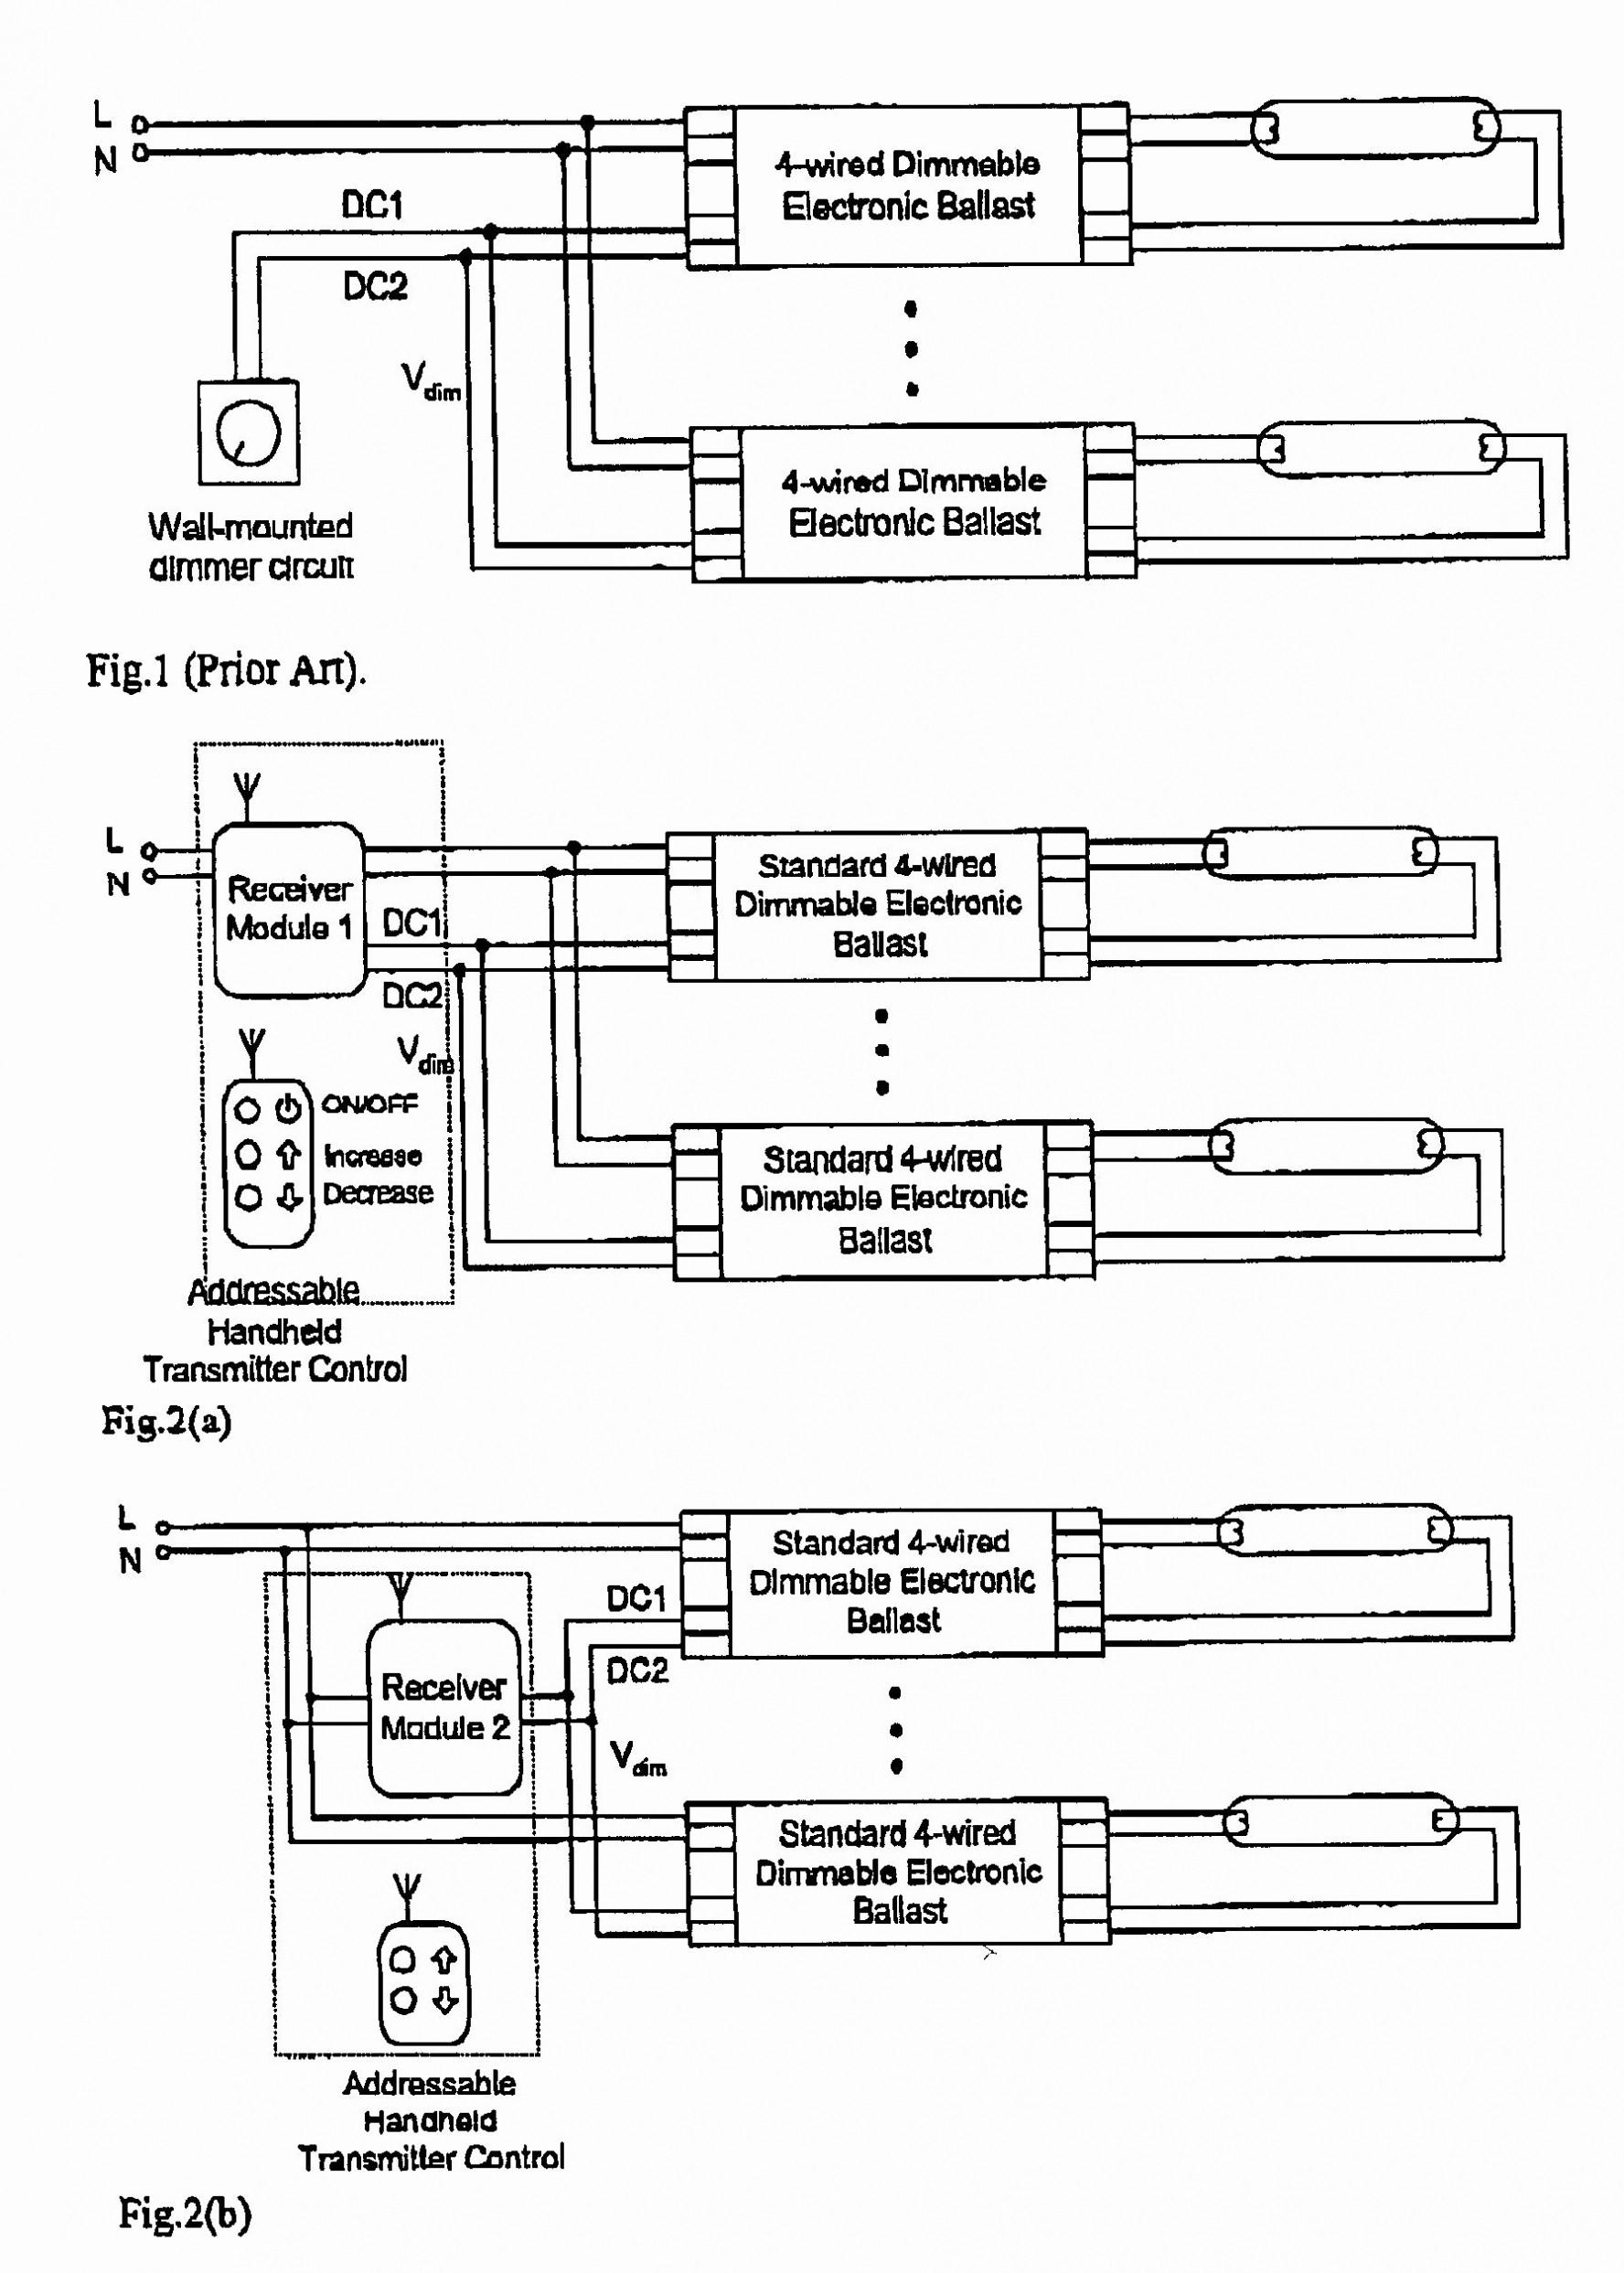 Philips Advance Ballast Wiring Diagram Recent 2 Lamp T8 Ballast - Ballast Wiring Diagram